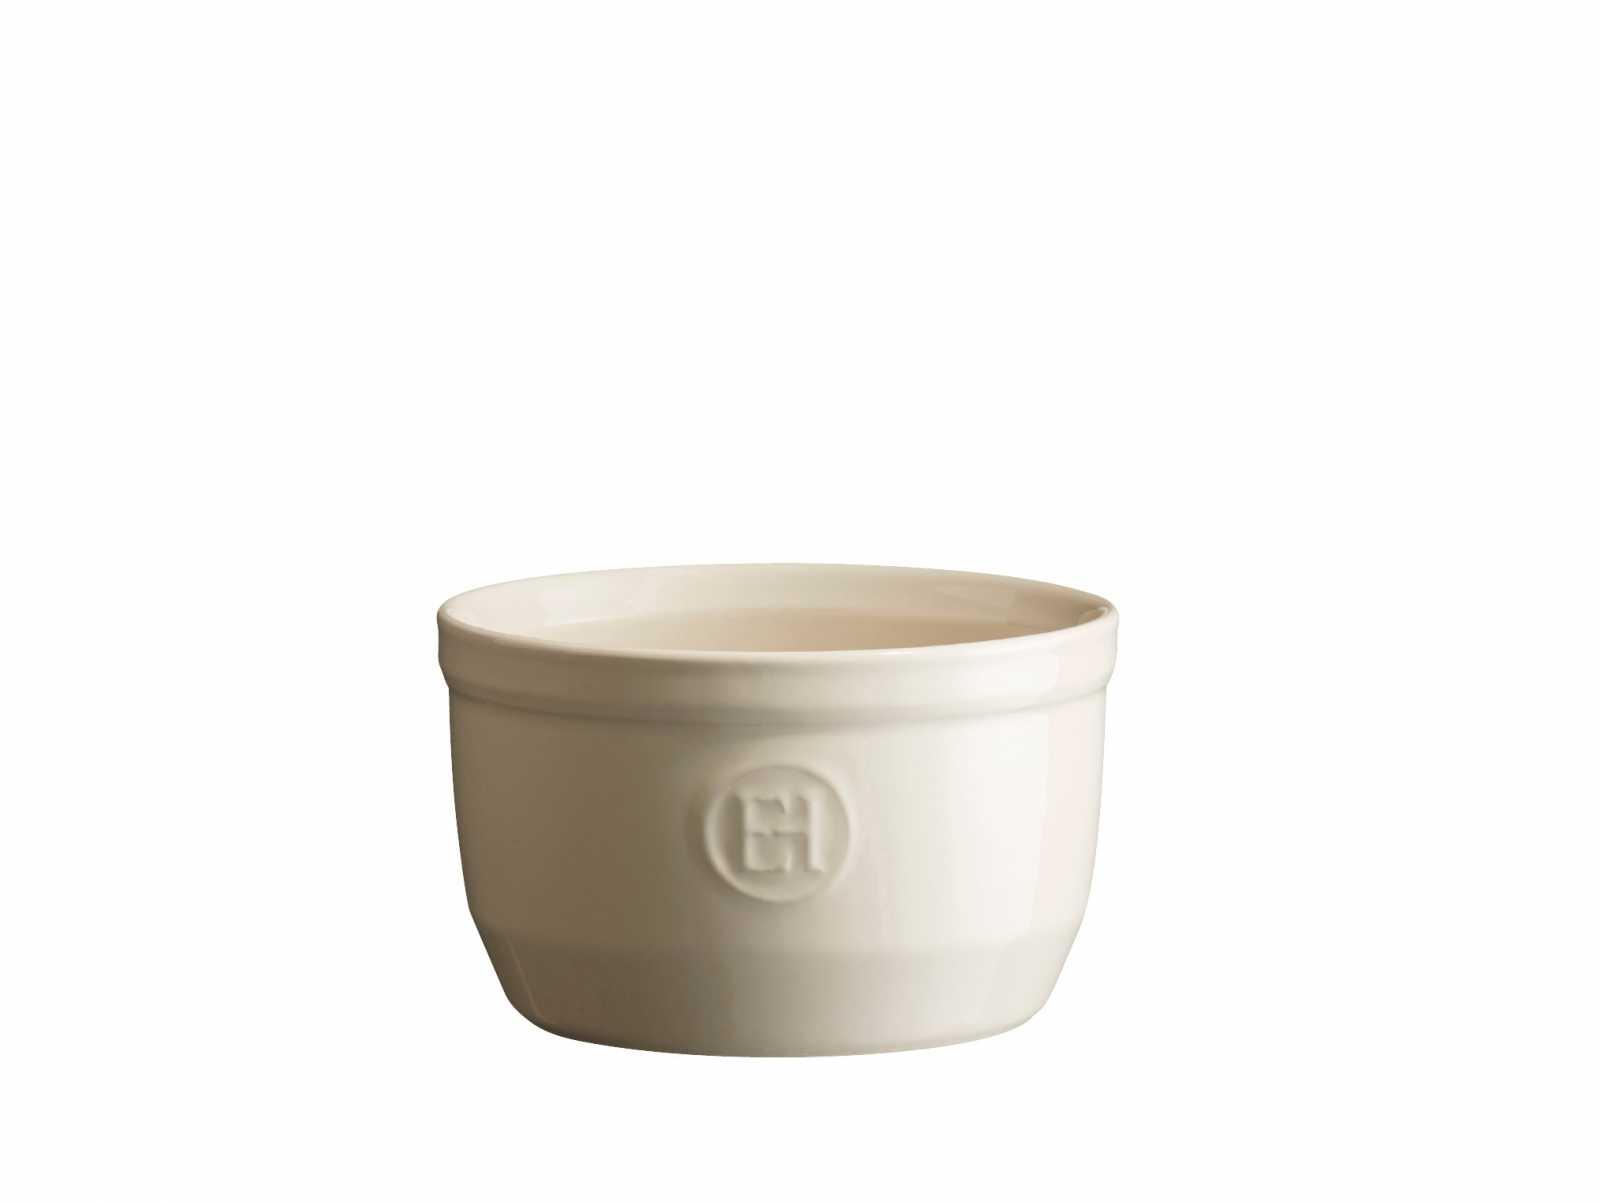 Онлайн каталог PROMENU: Форма порционная Emile Henry, диаметр 10,5 см, бежевый Emile Henry 021010